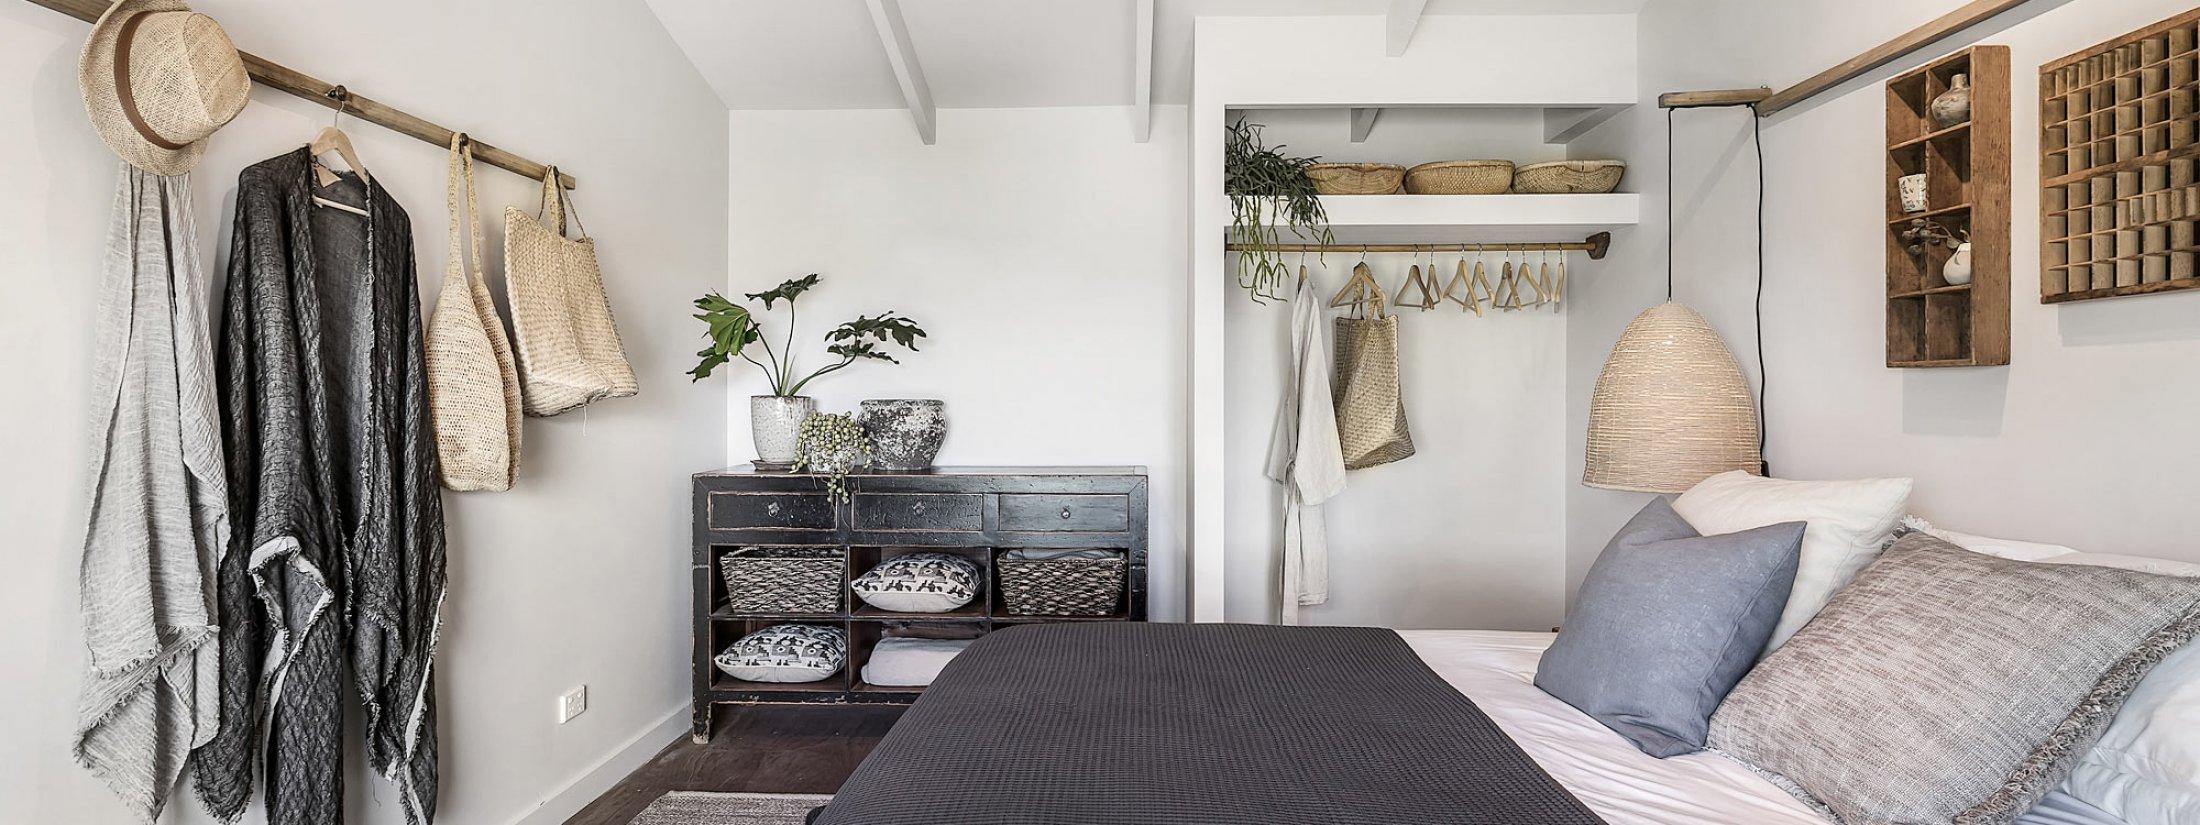 Eastern Rise Studio - Byron Bay Hinterland - Bedroom2 - 1a